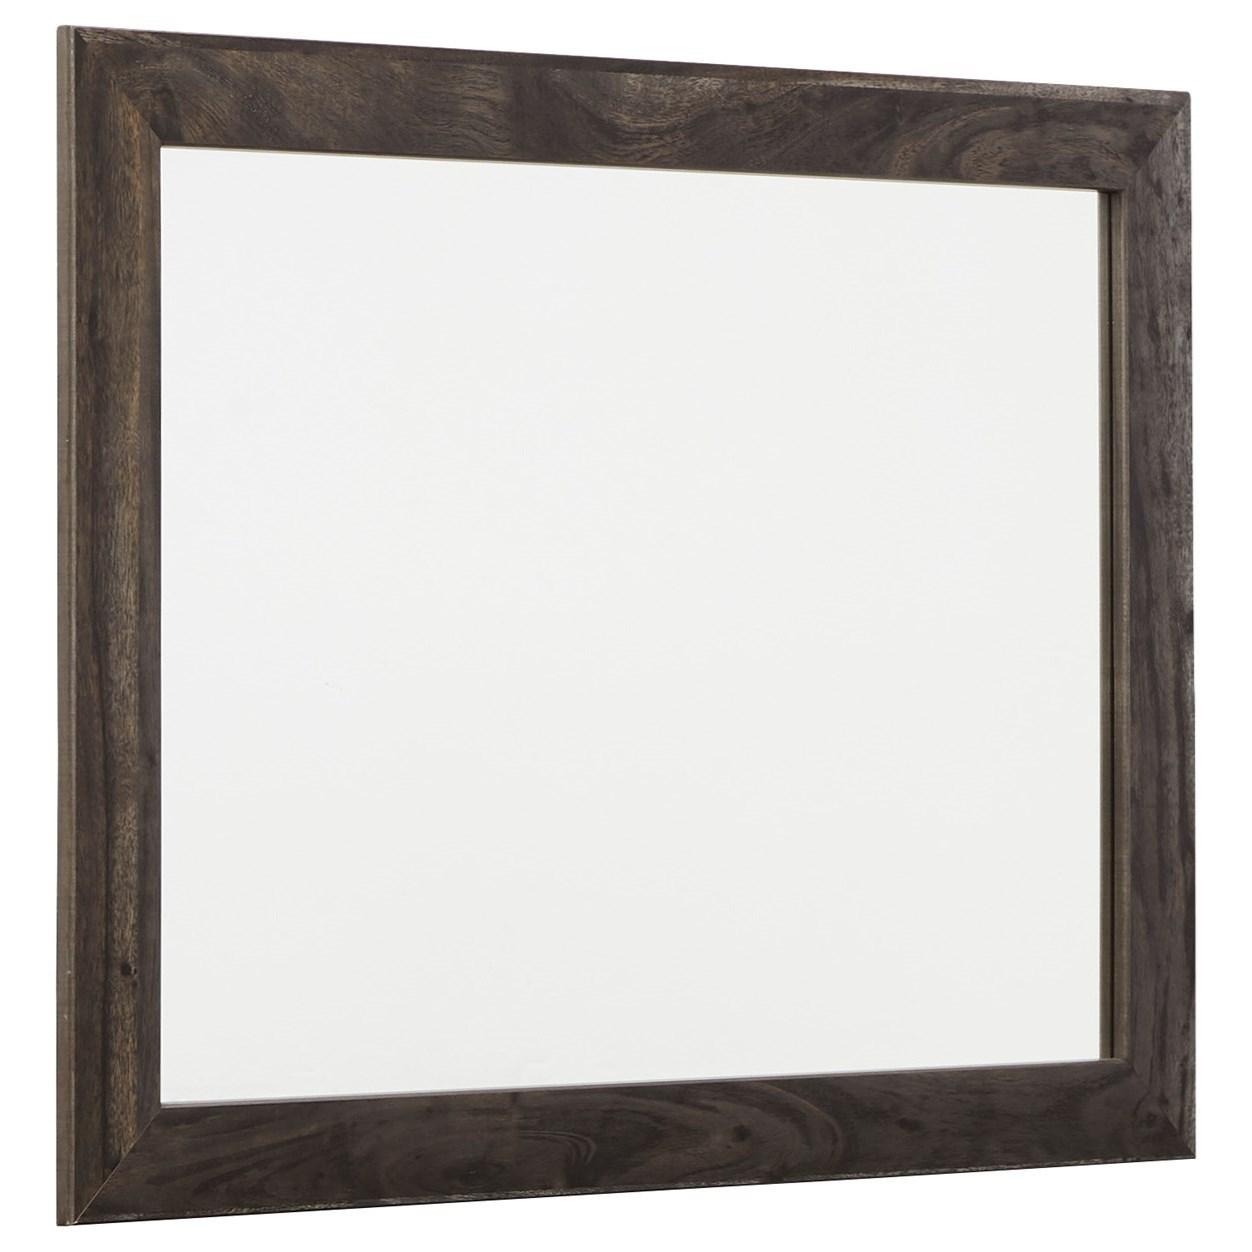 Vay Bay Bedroom Mirror by Benchcraft at Furniture Barn